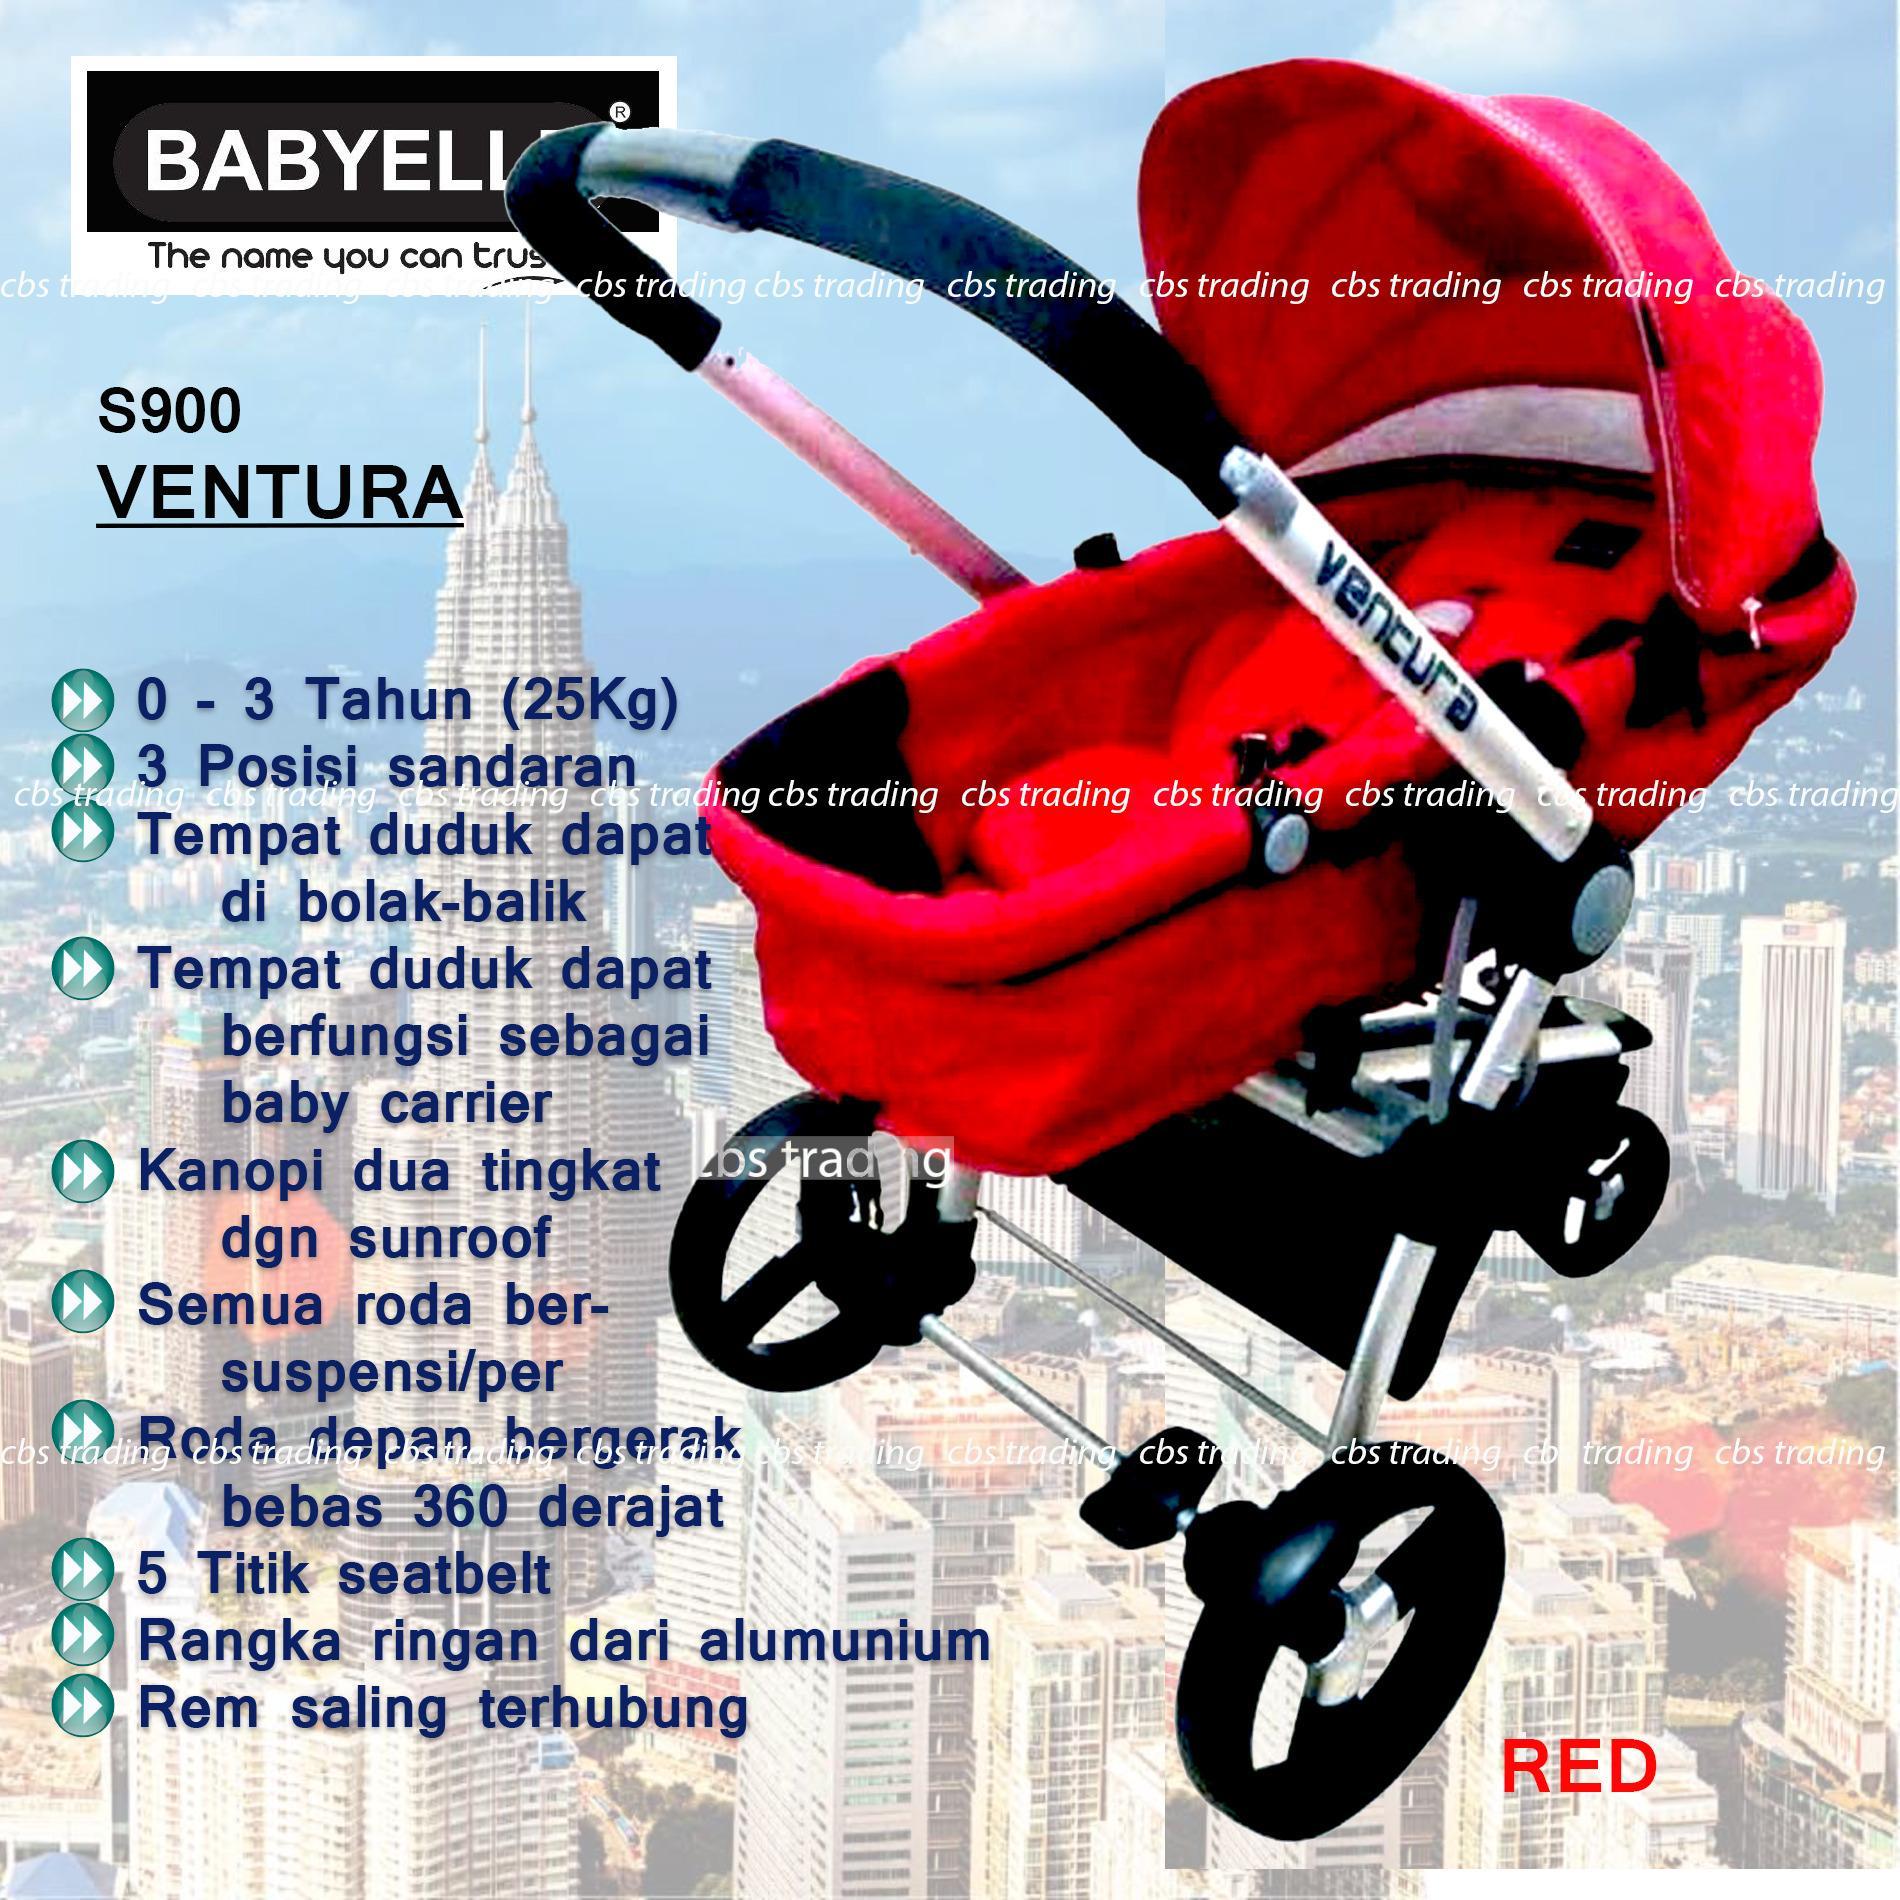 Jual Produk Baby Elle Terlengkap Babyelle Automatic Swing Pink 32007 Stroller S 900 Ventura Kereta Dorong Bayi Merah